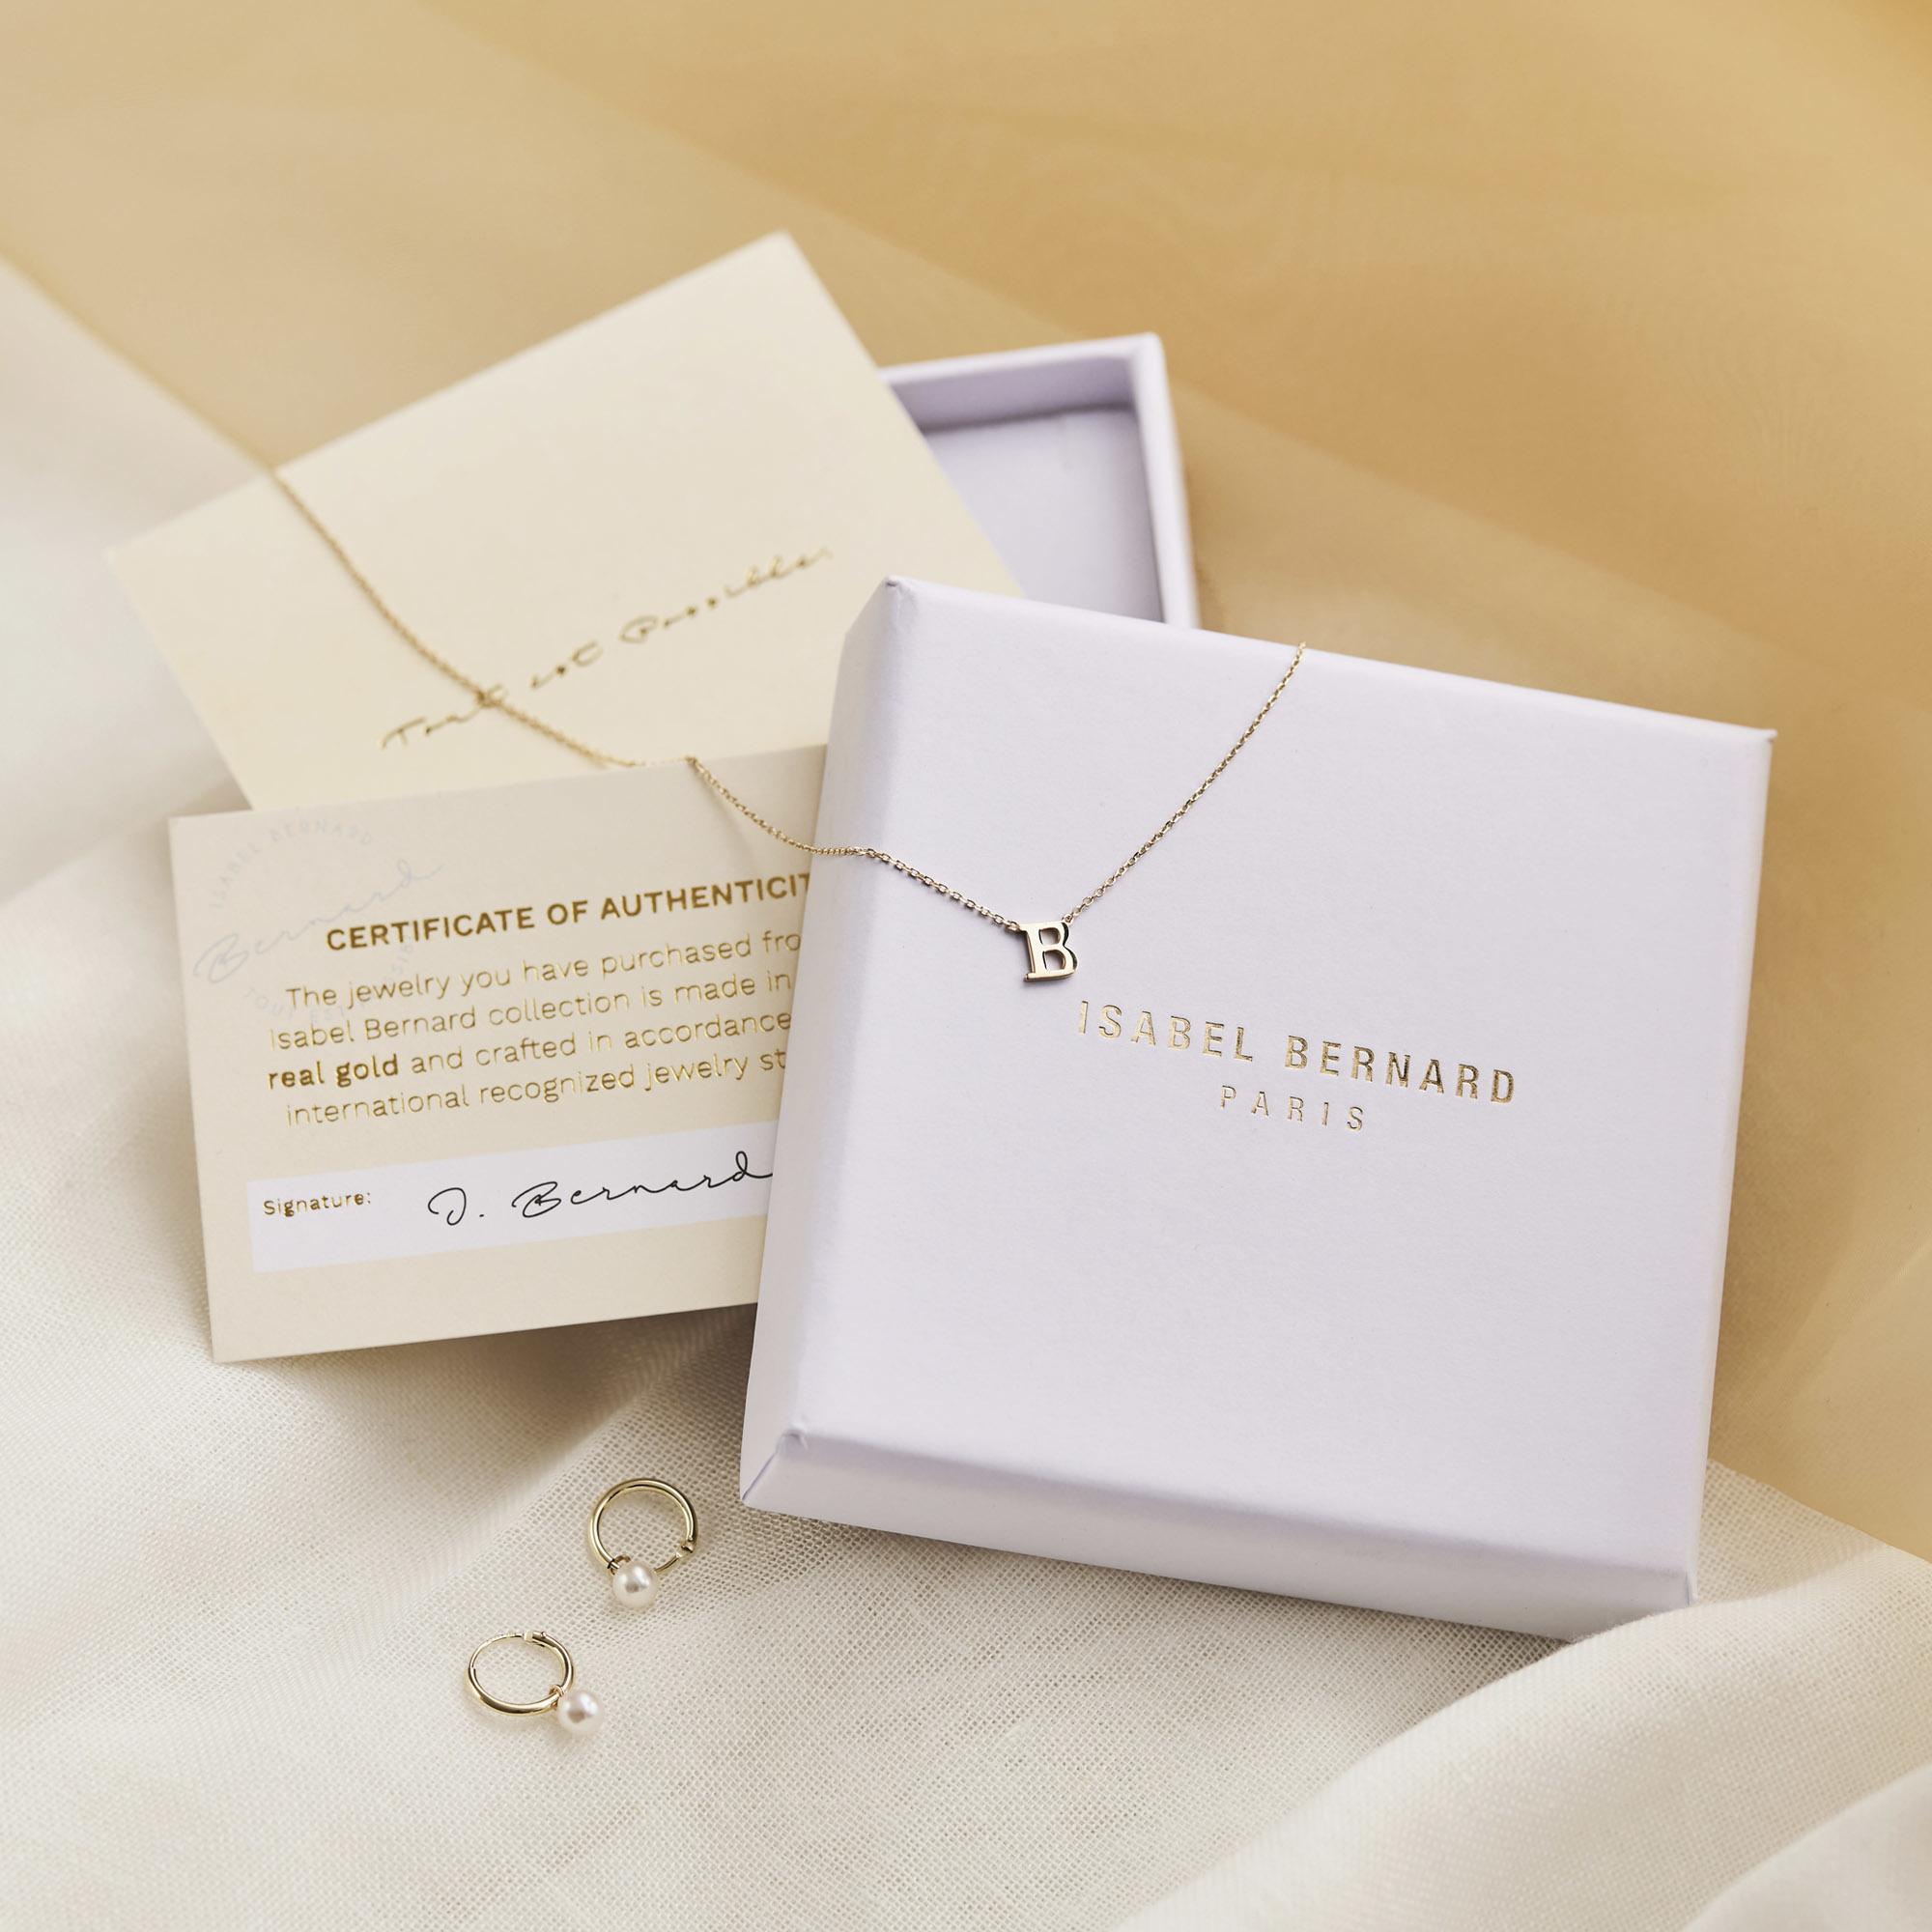 Isabel Bernard Saint Germain Faïs bracciale in oro bianco 14 carati